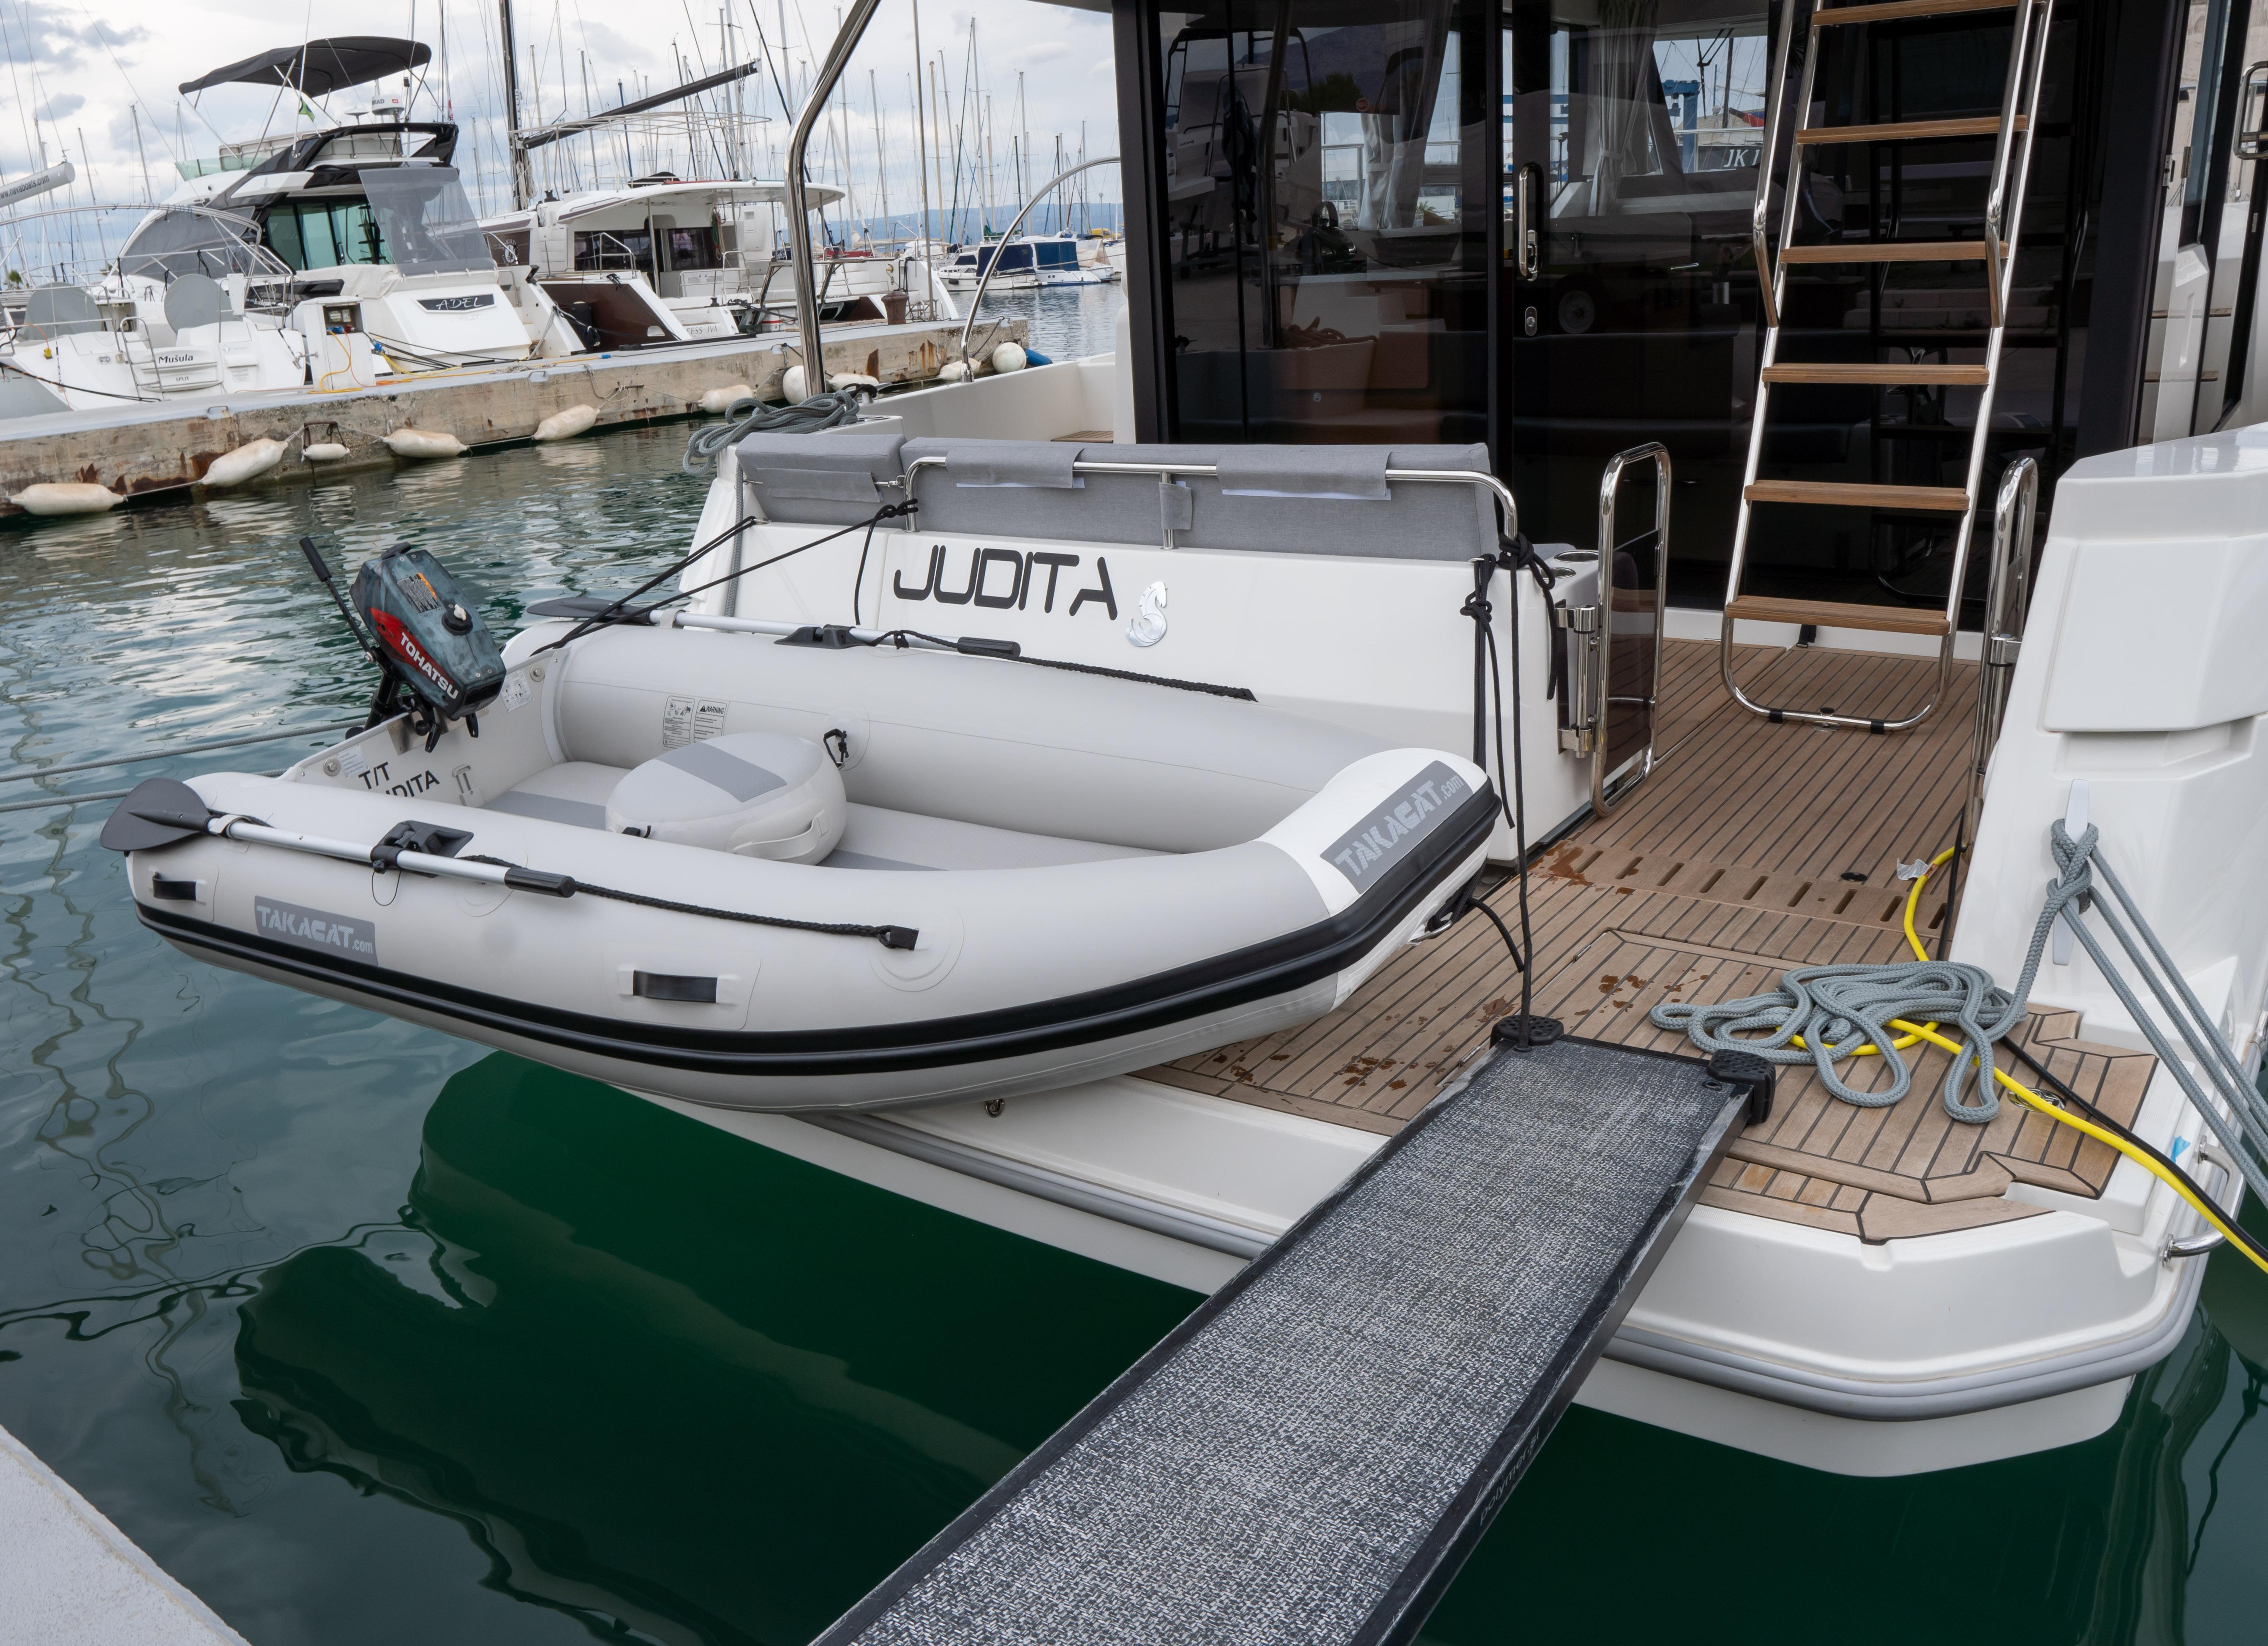 Swift Trawler 41 (2020) (JUDITA)  - 3